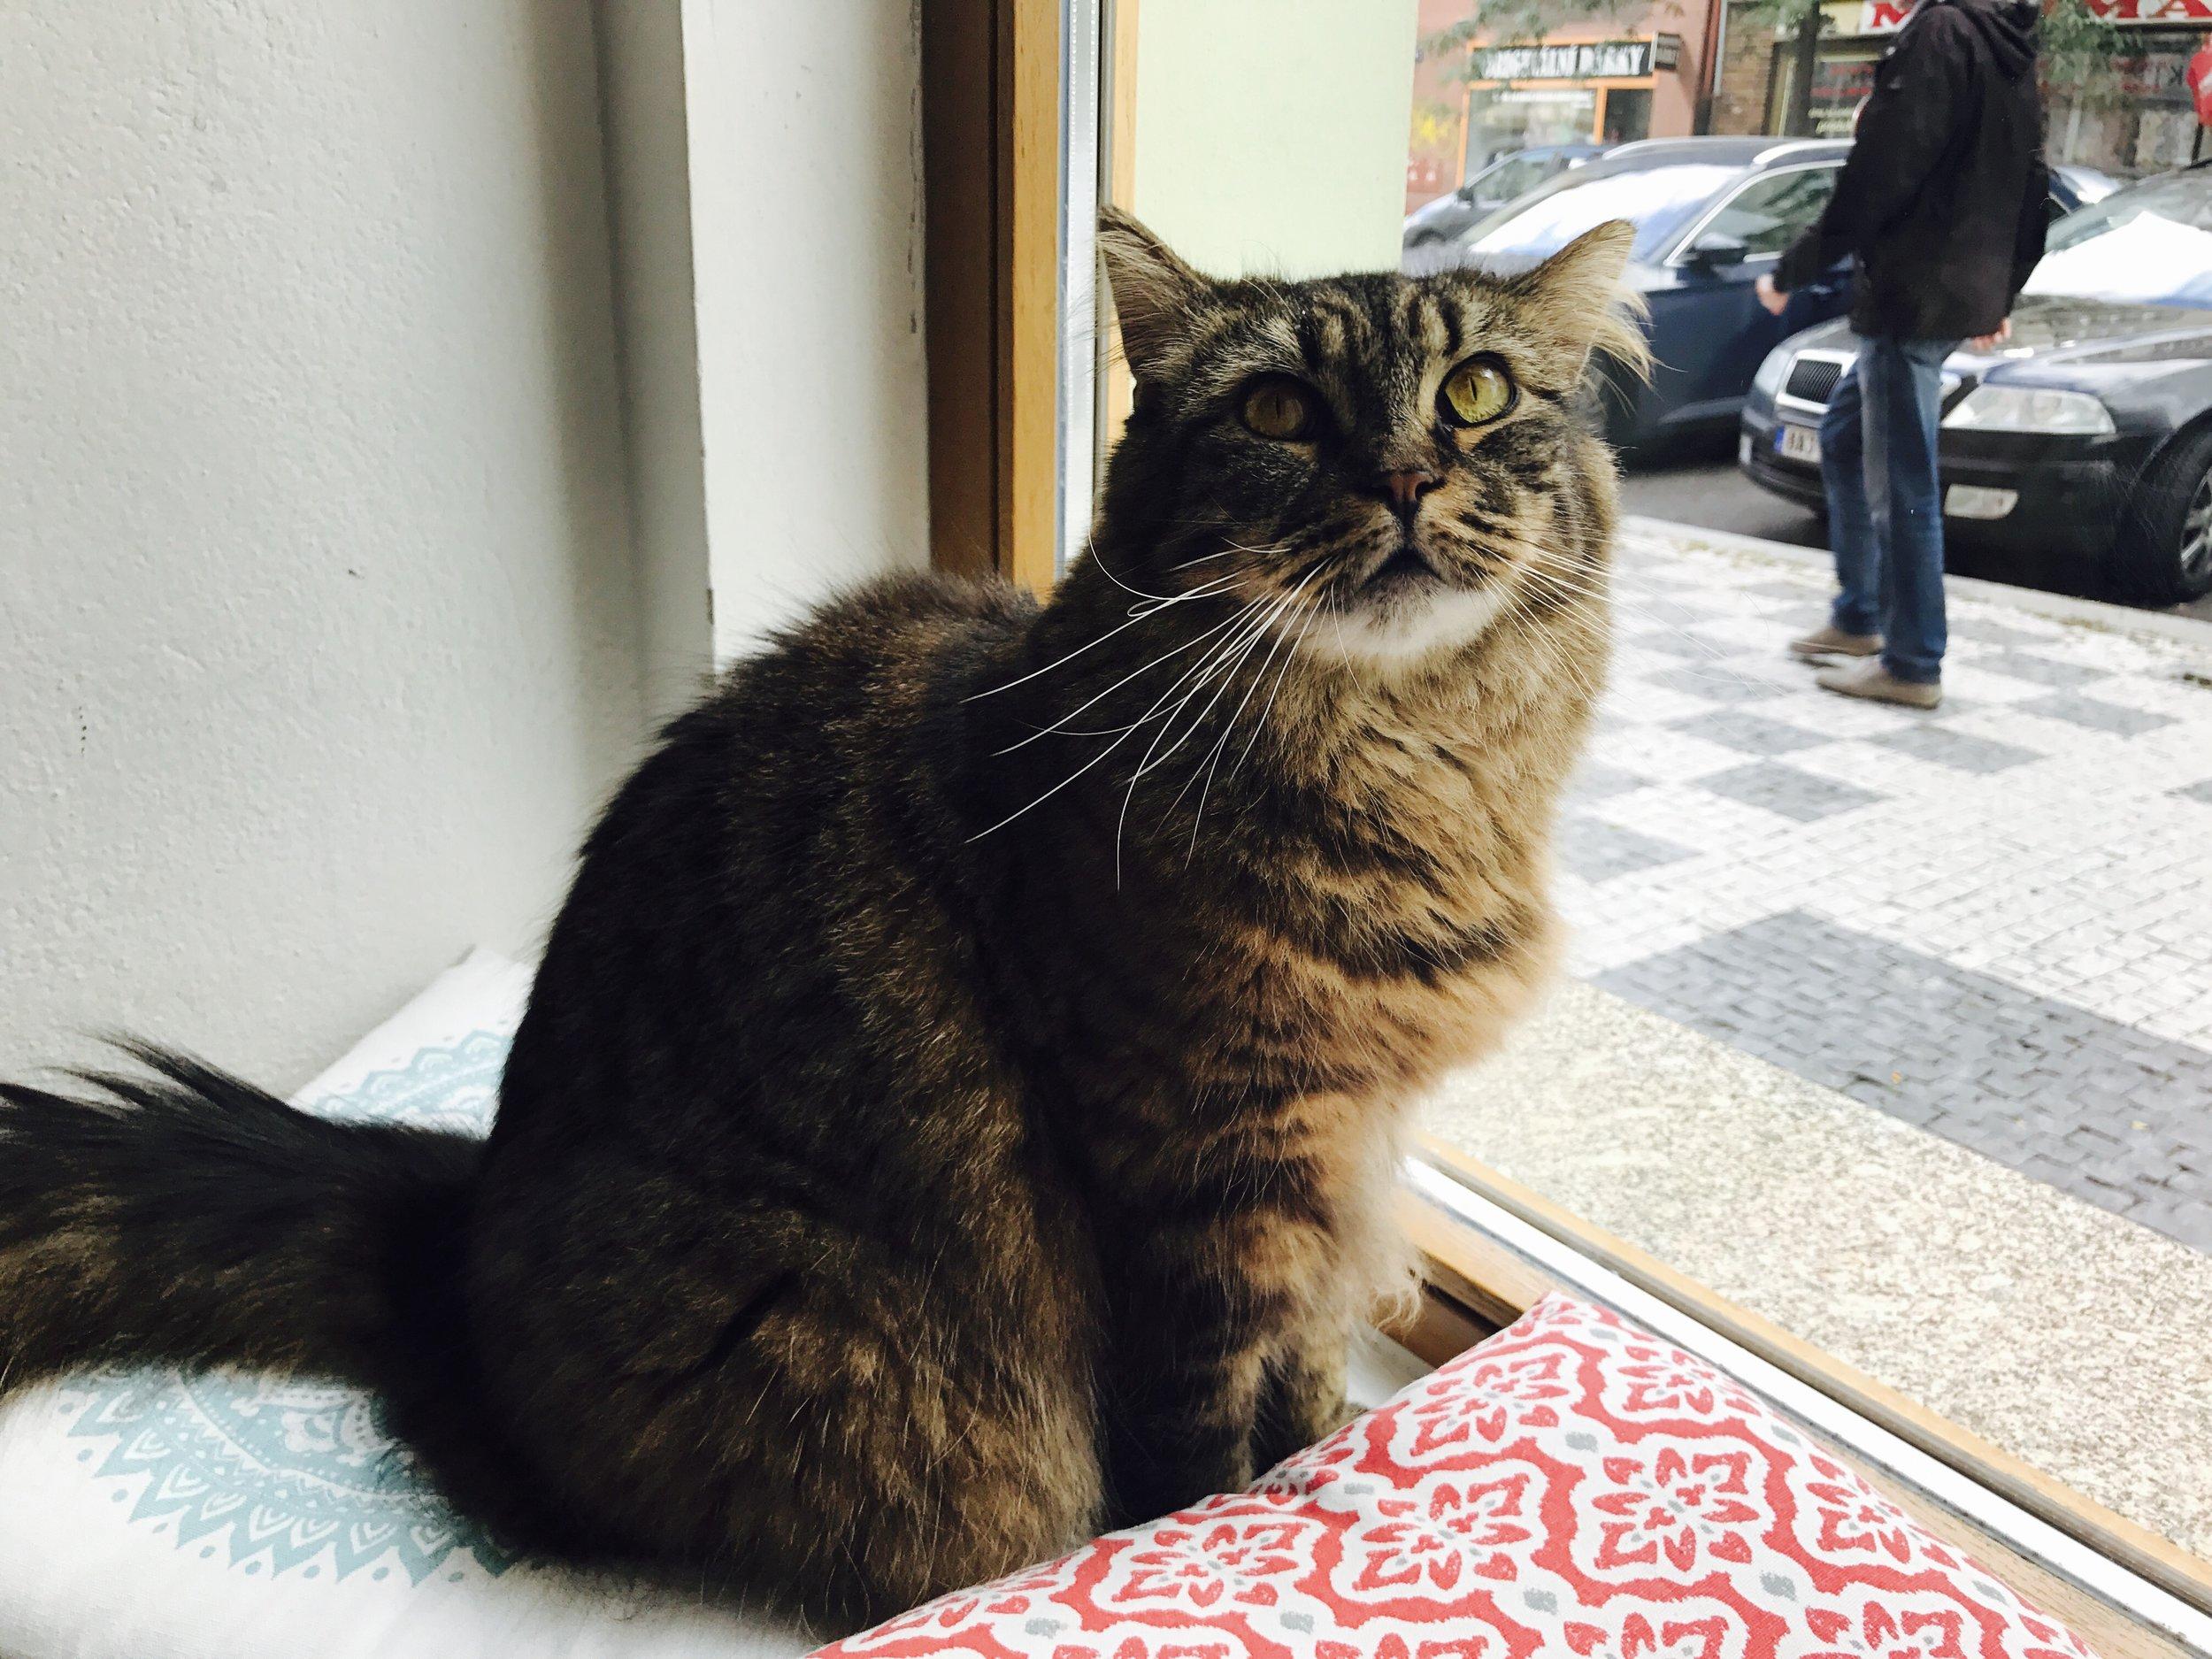 Nine cats live at Kavarna Kocici, including Skorice